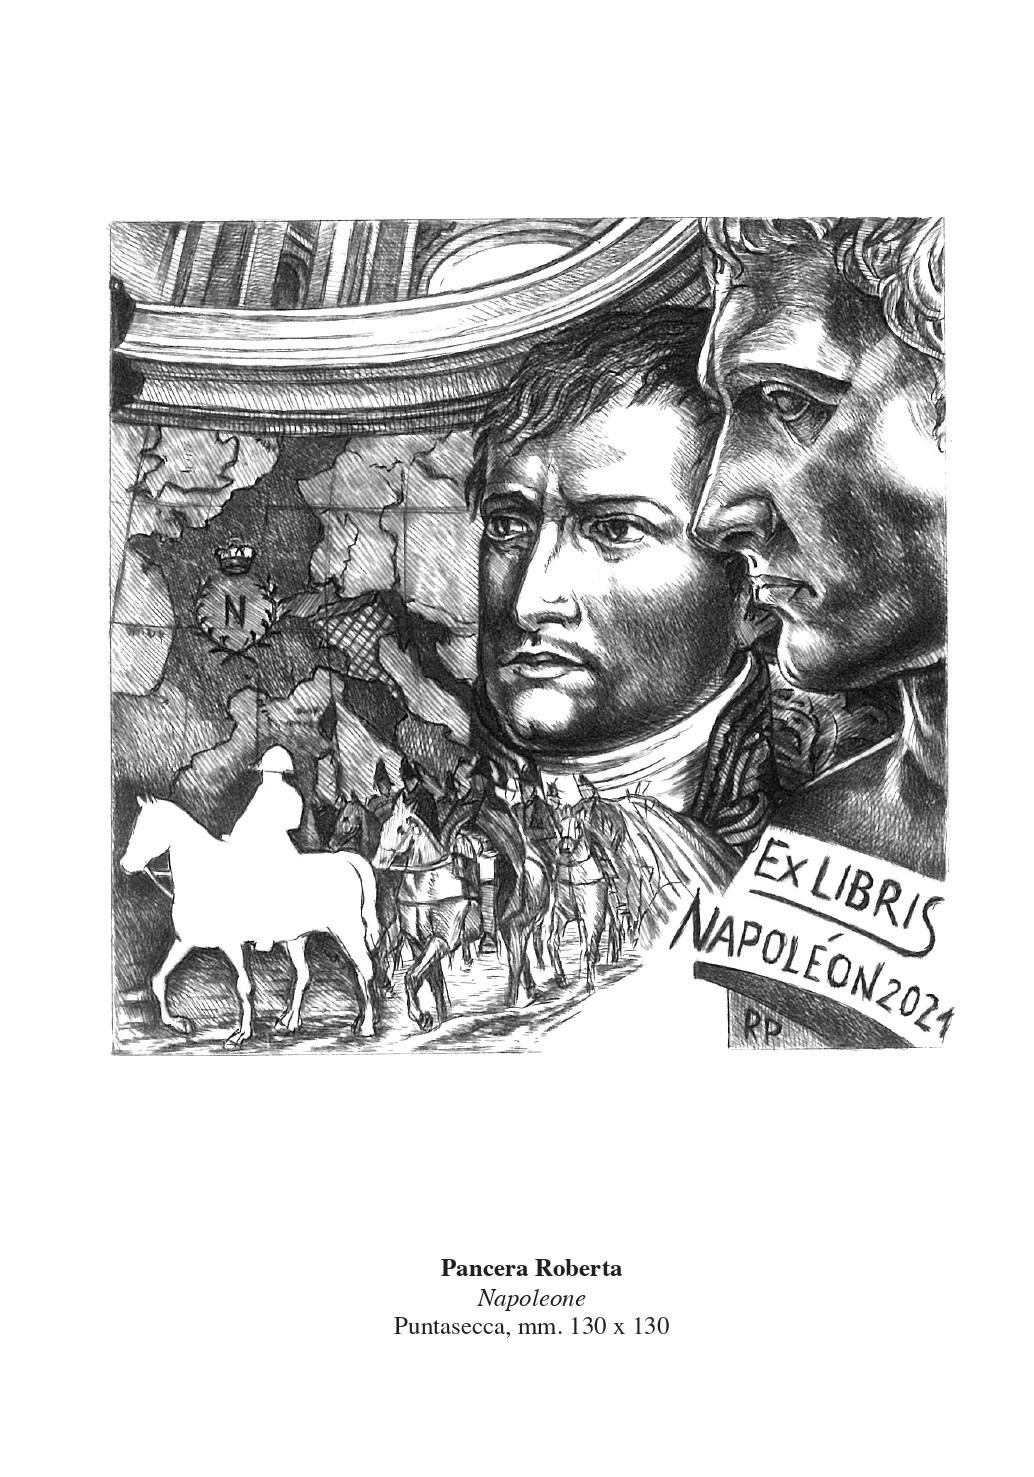 CATALOGO exlibris 2021-116_page-0001